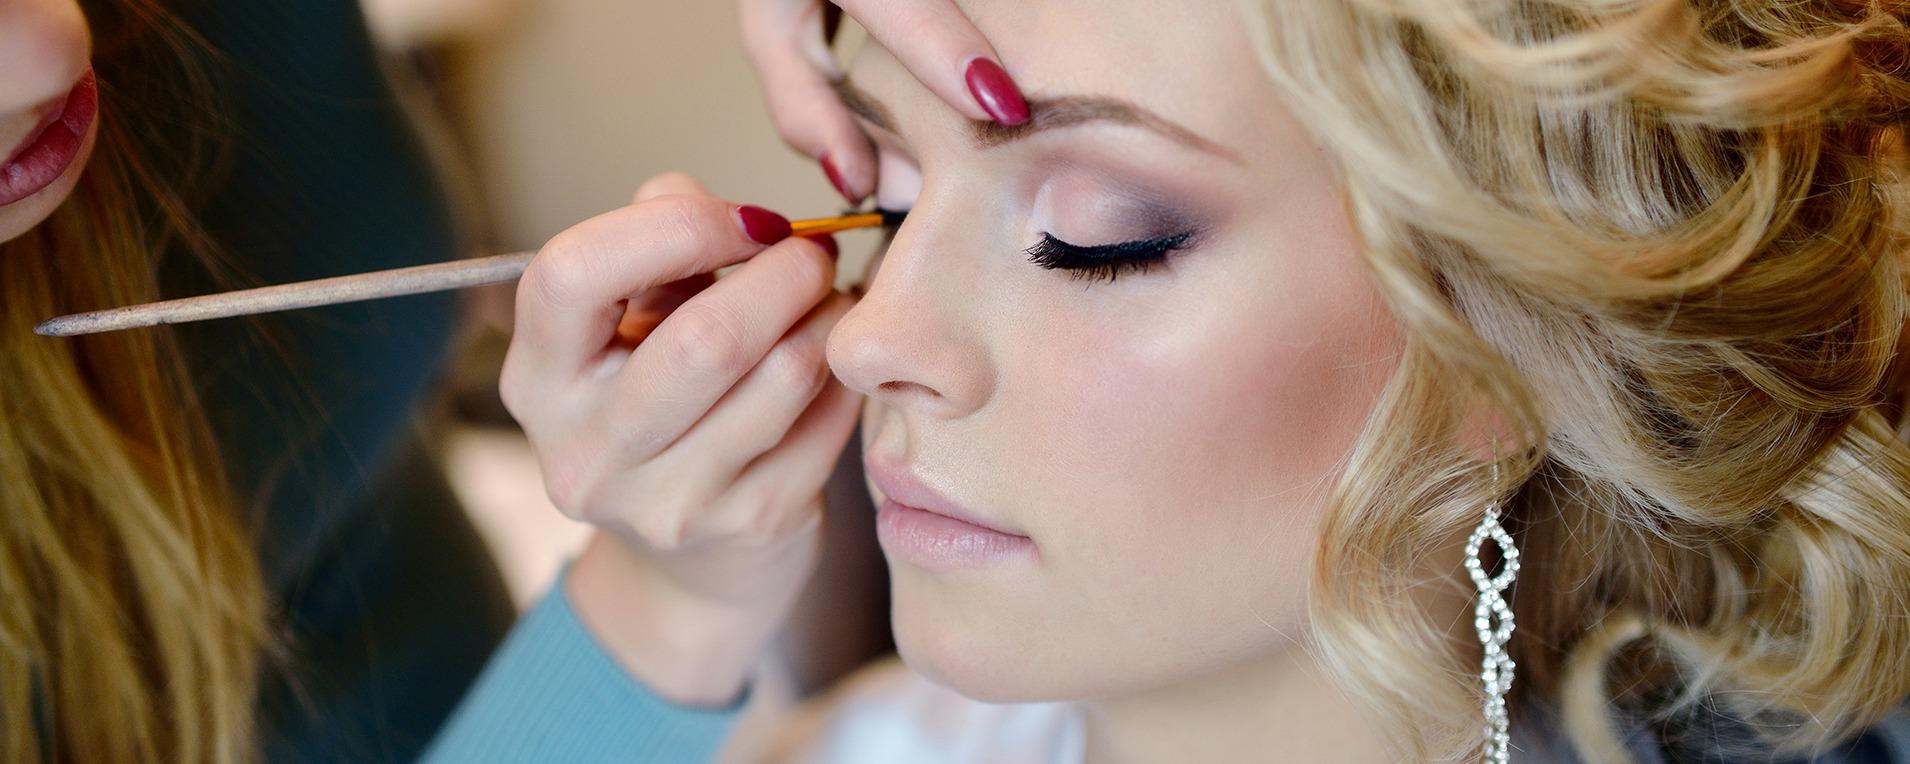 31-tivoli-forma-academy-corso-trucco-make-up-sposa